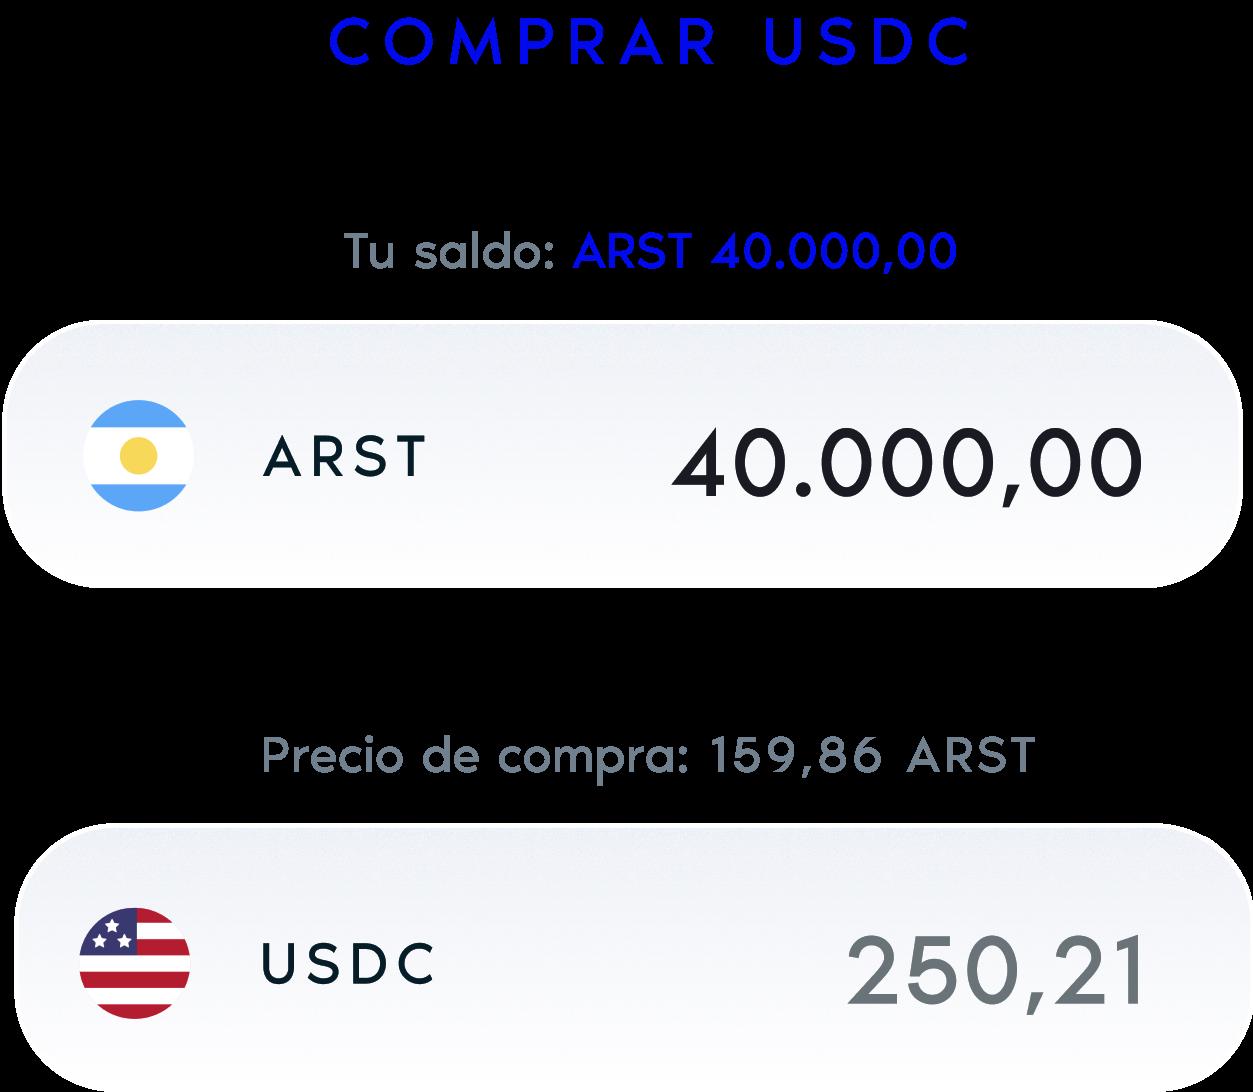 Comprá USDC